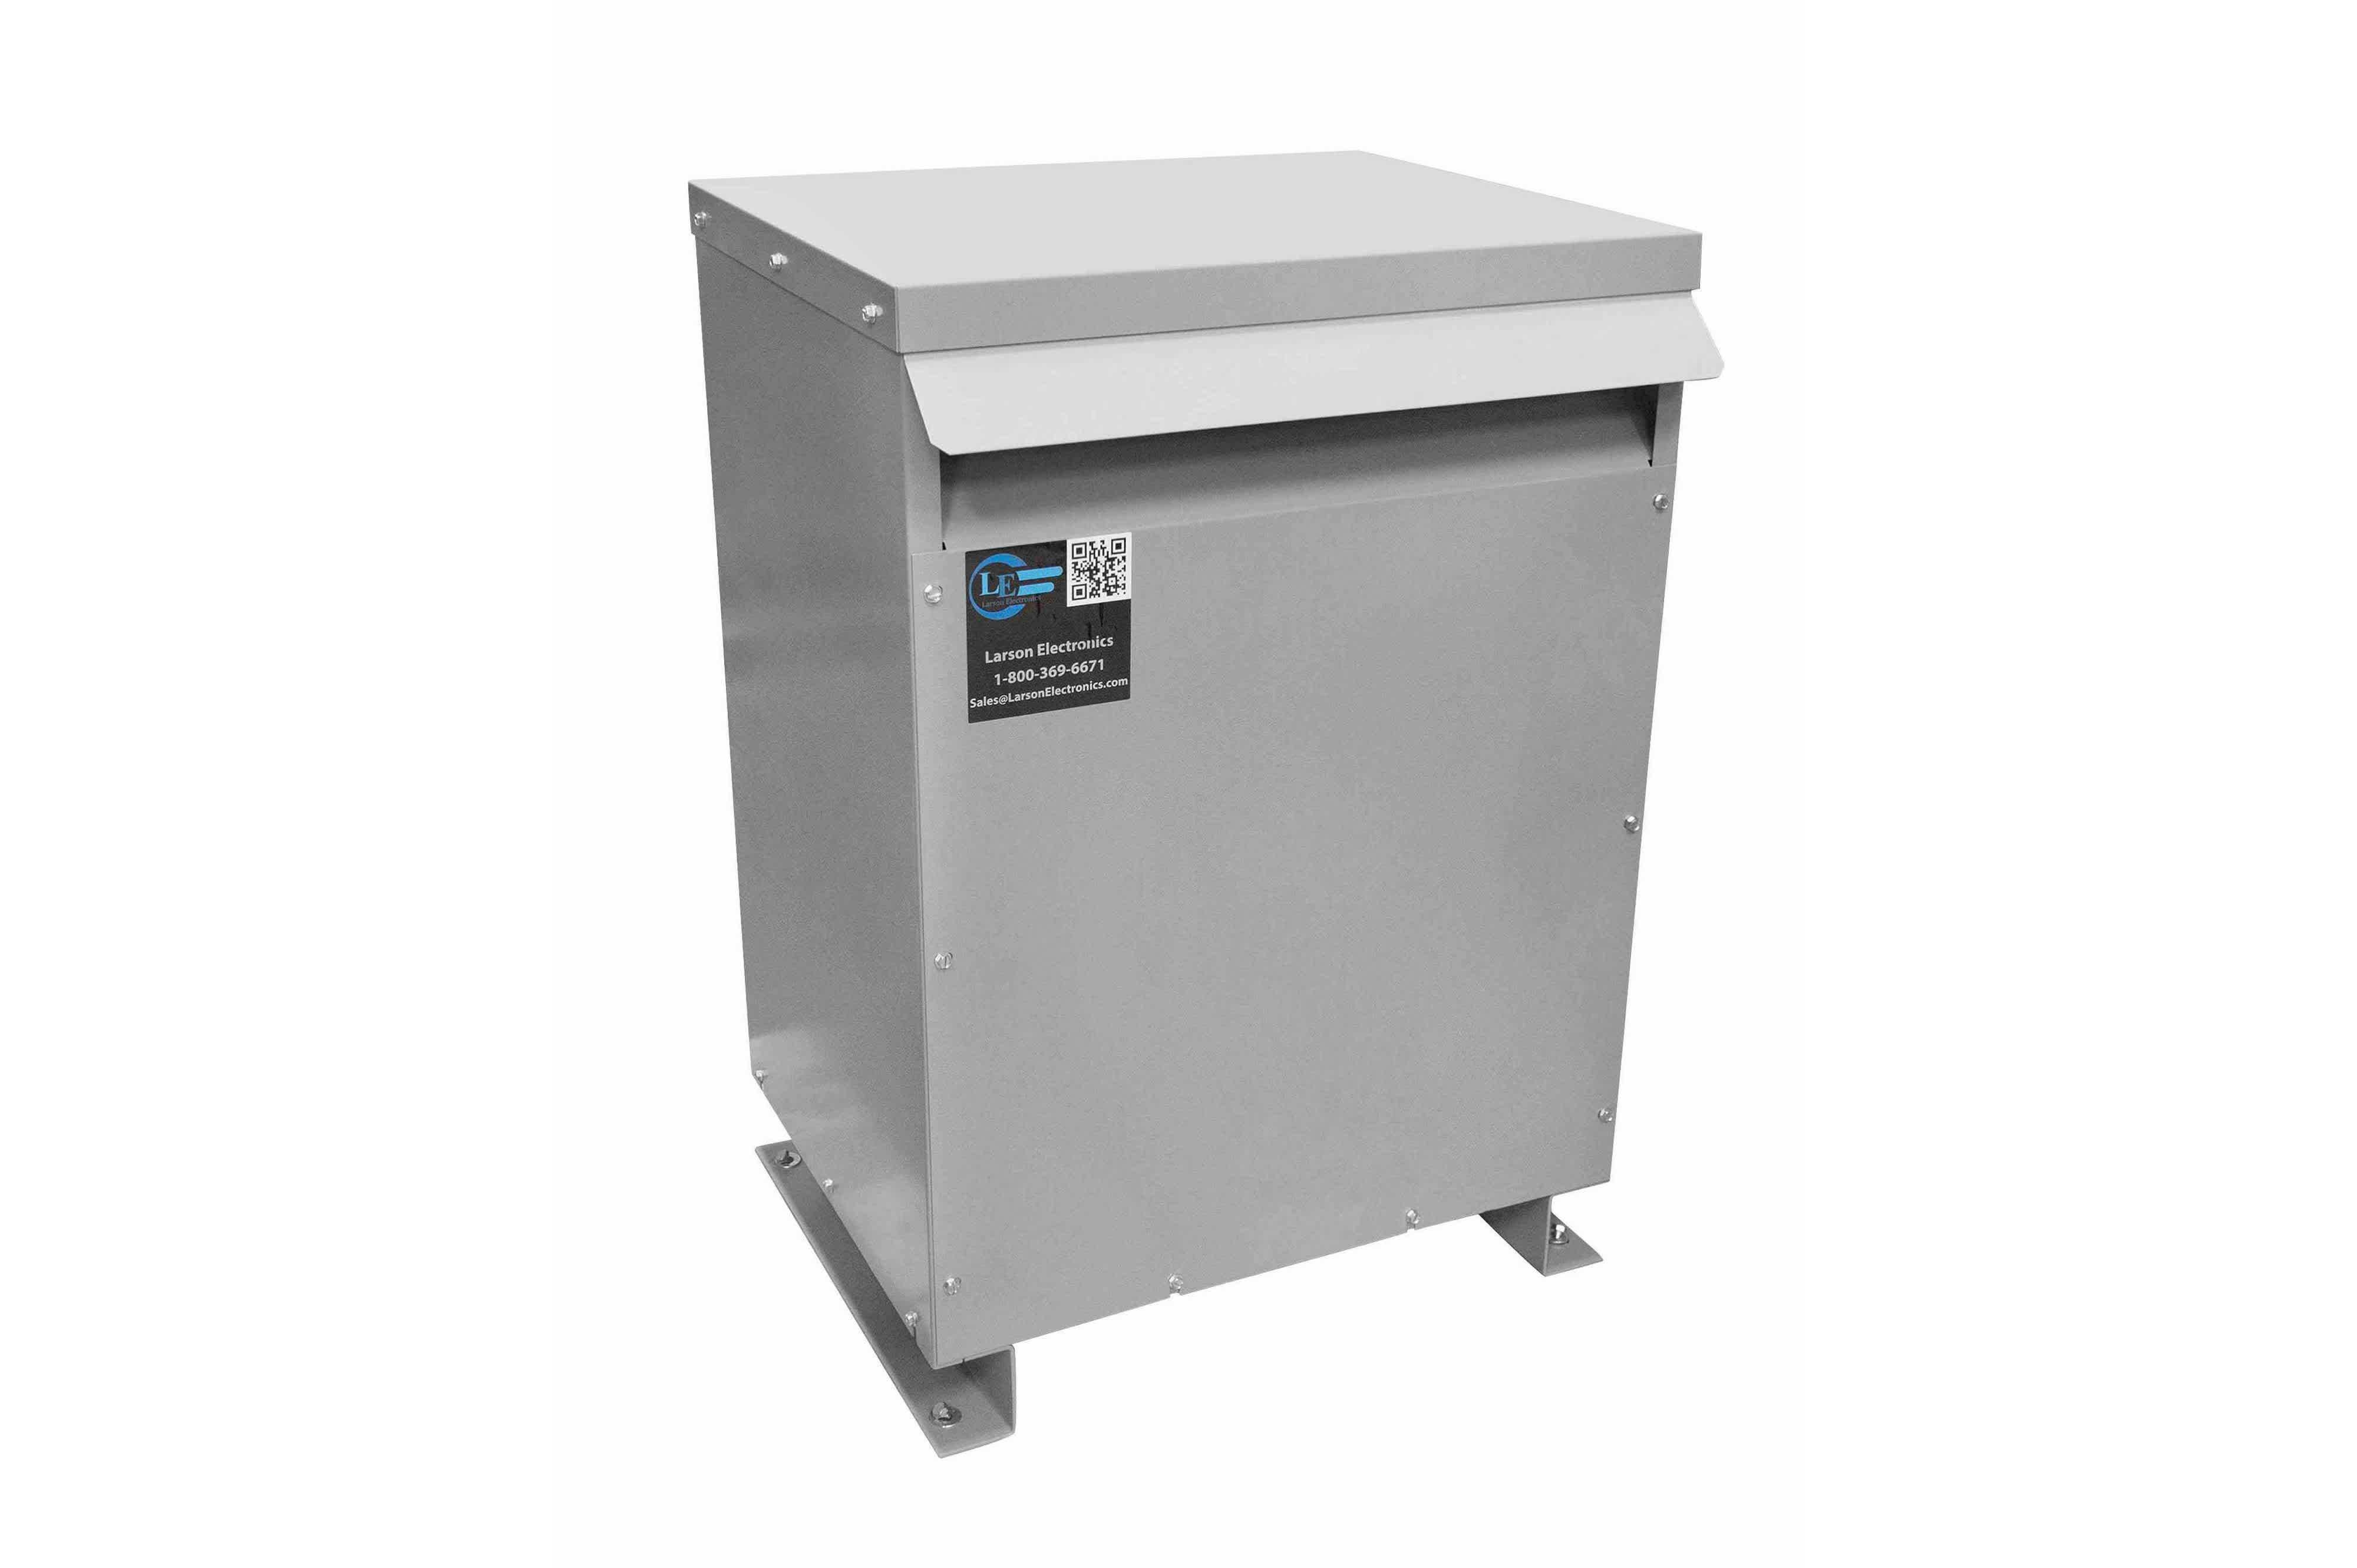 22.5 kVA 3PH Isolation Transformer, 240V Wye Primary, 600Y/347 Wye-N Secondary, N3R, Ventilated, 60 Hz